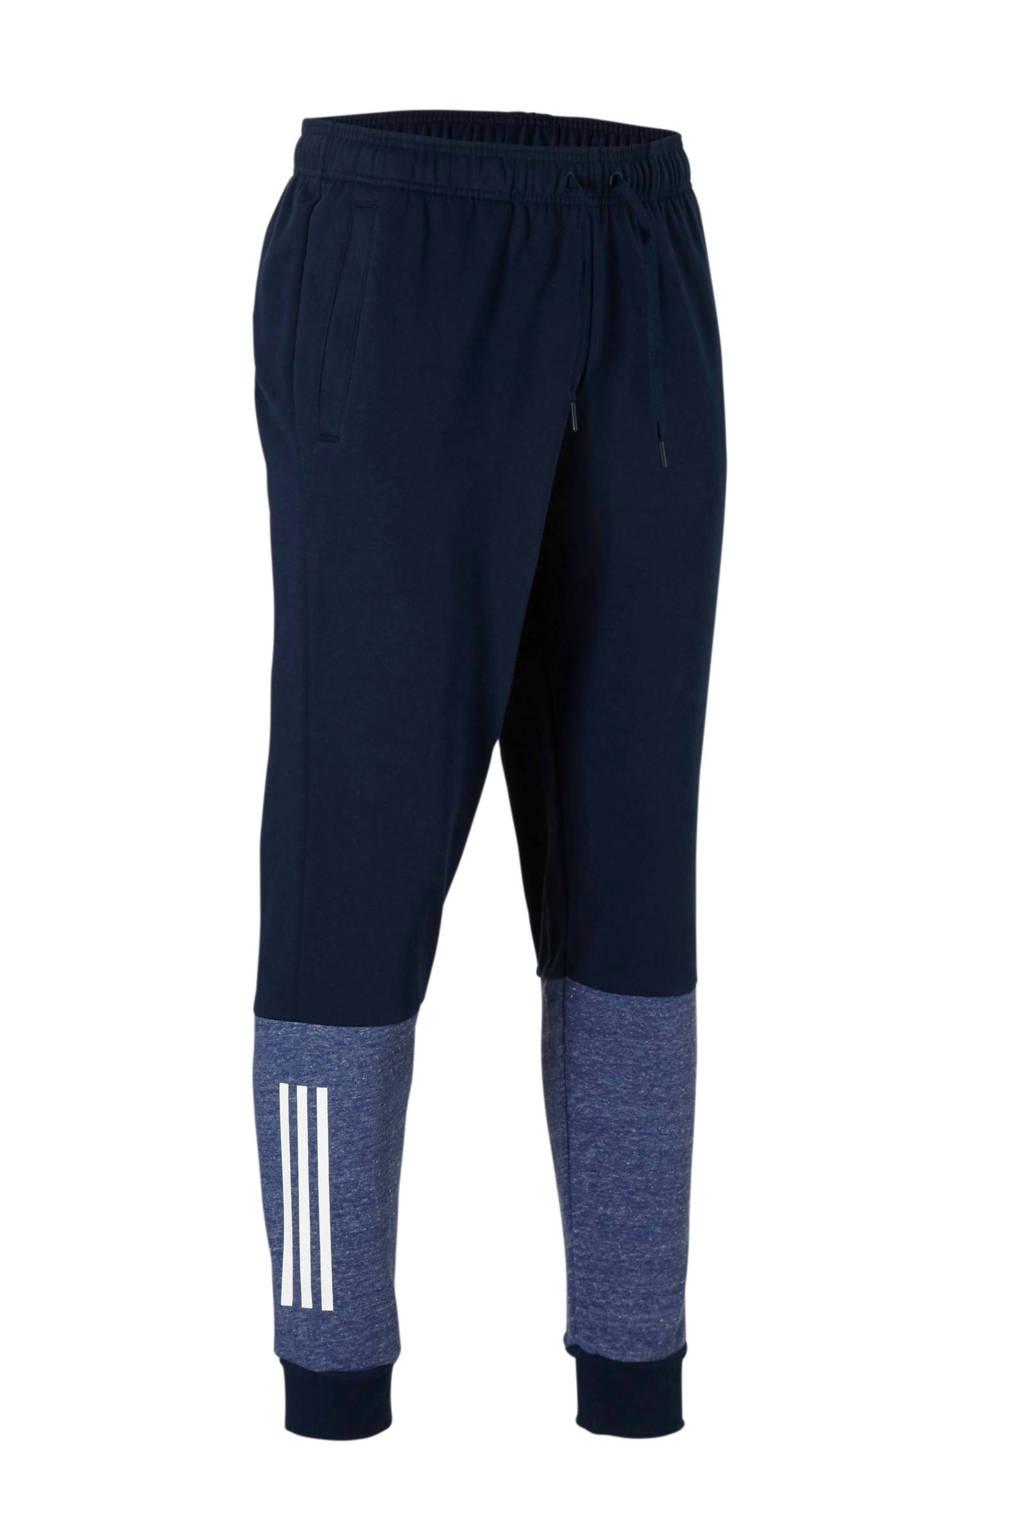 adidas performance joggingbroek donkerblauw, Blauw